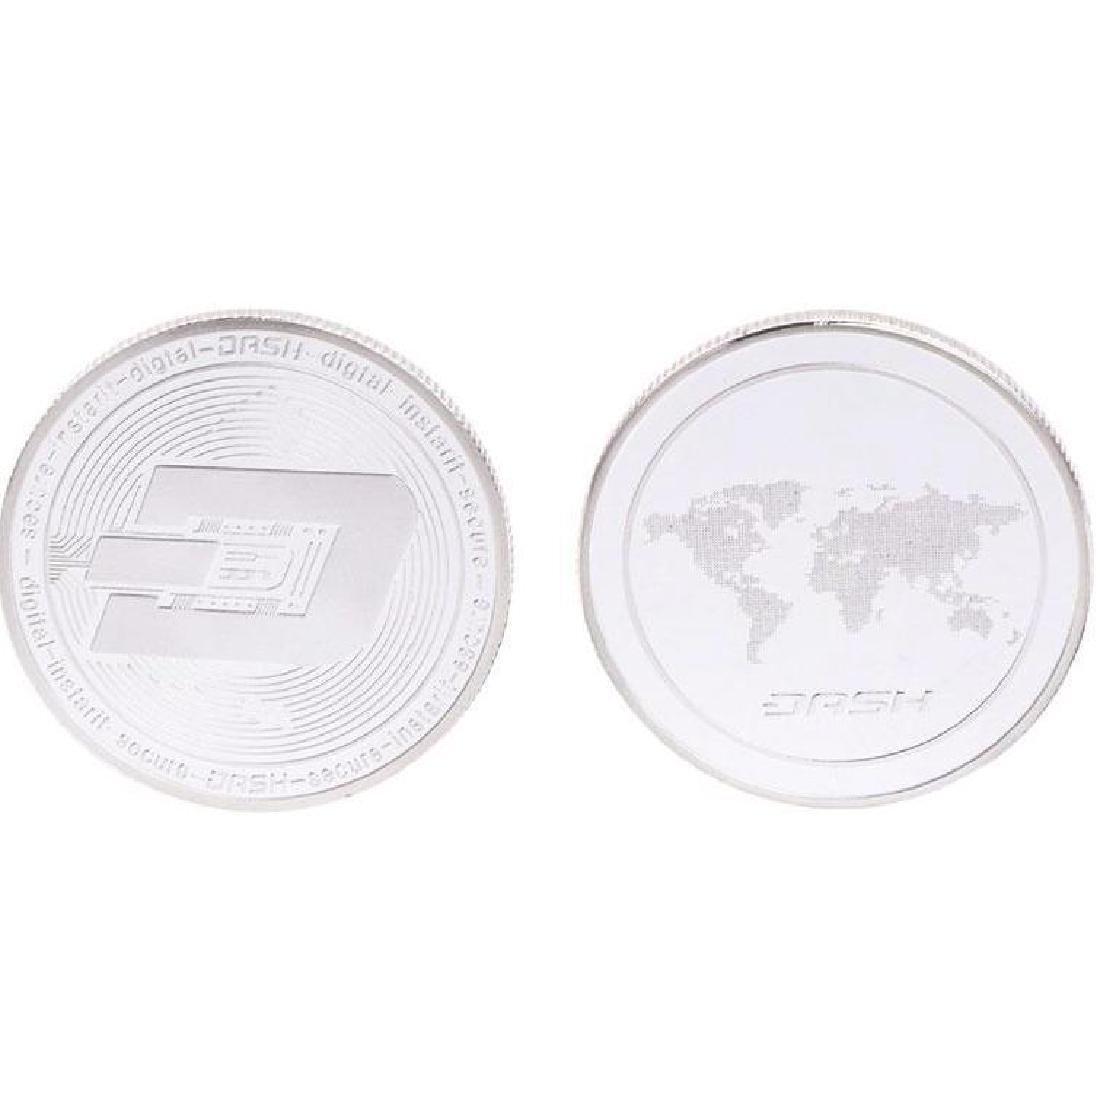 Dash Digital Silver Clad Crypto Coin